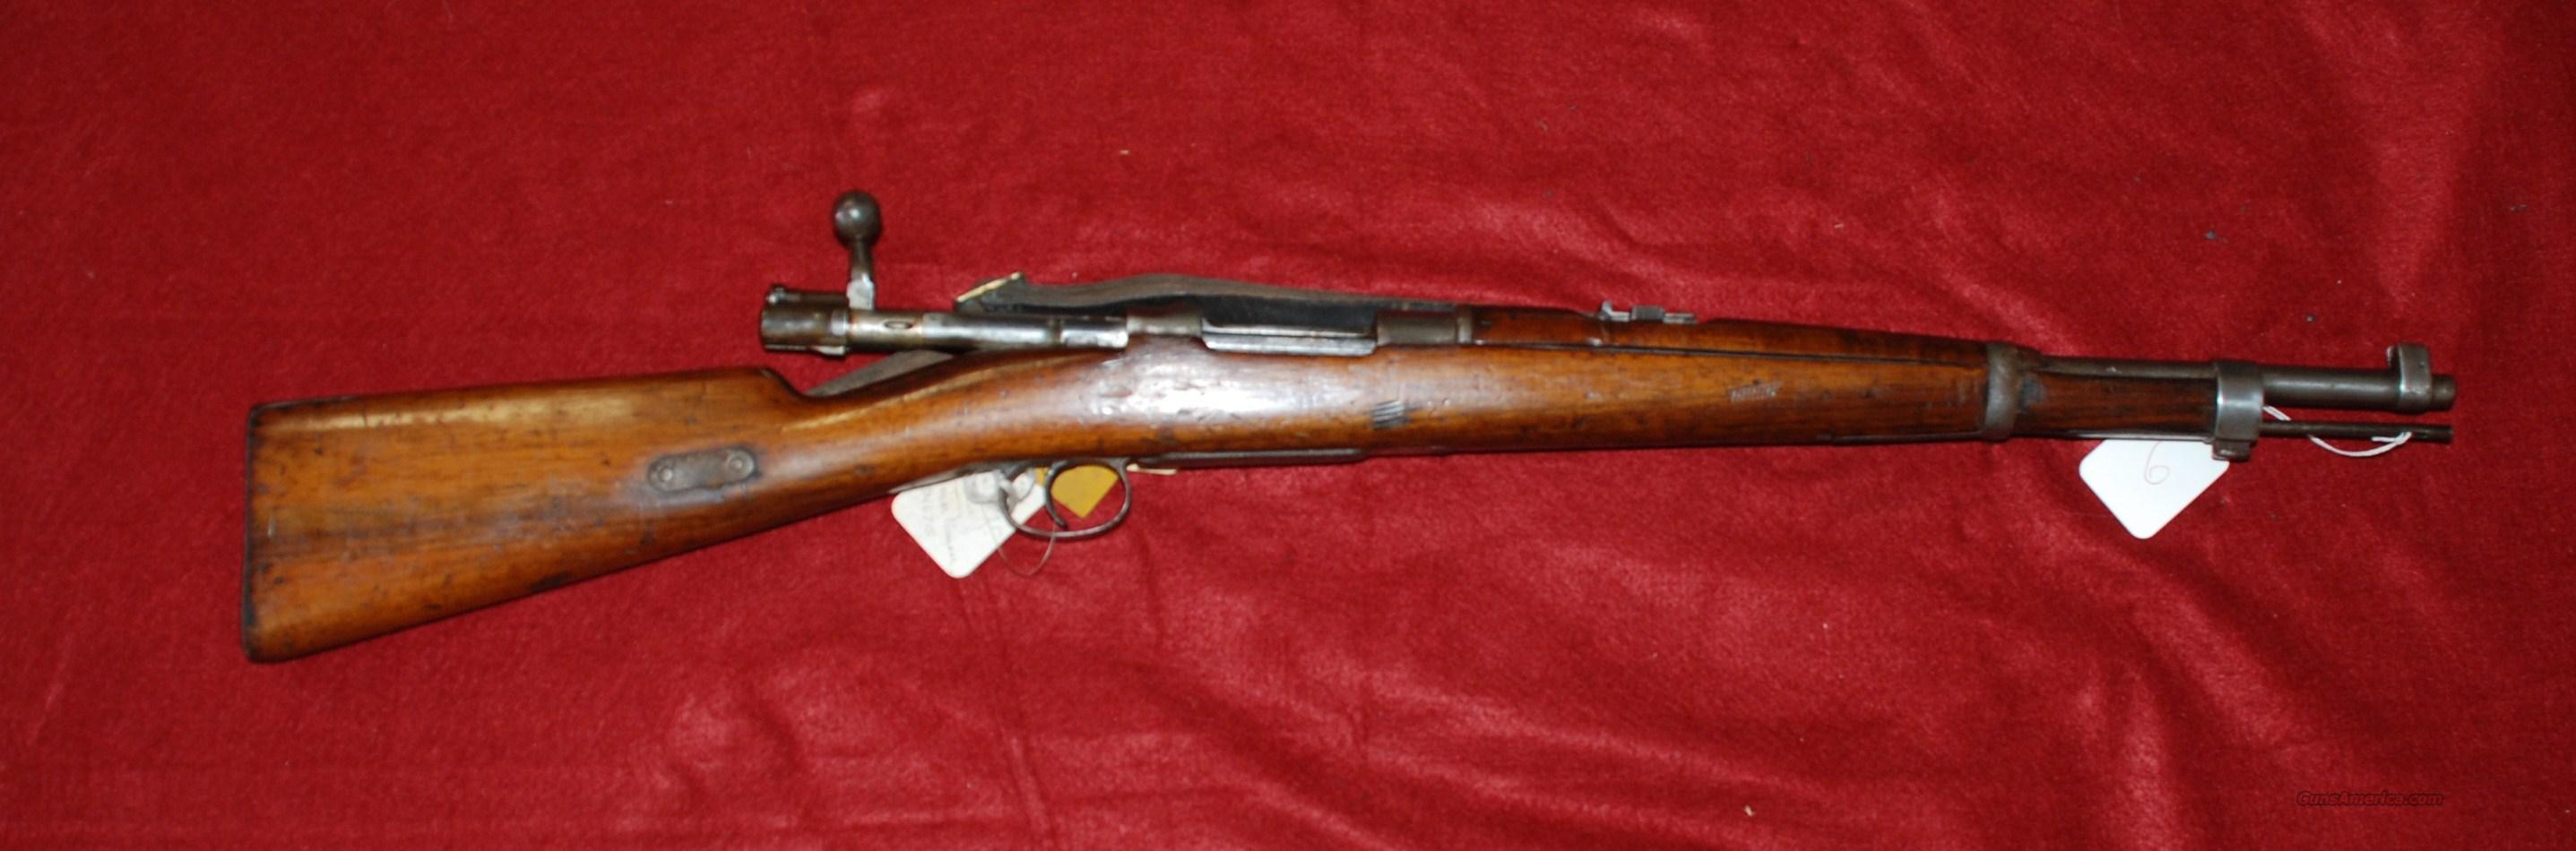 Mauser Chileno Modelo 1895 Guns > Rifles > Mauser Rifles > Spanish.  1840088.jpg